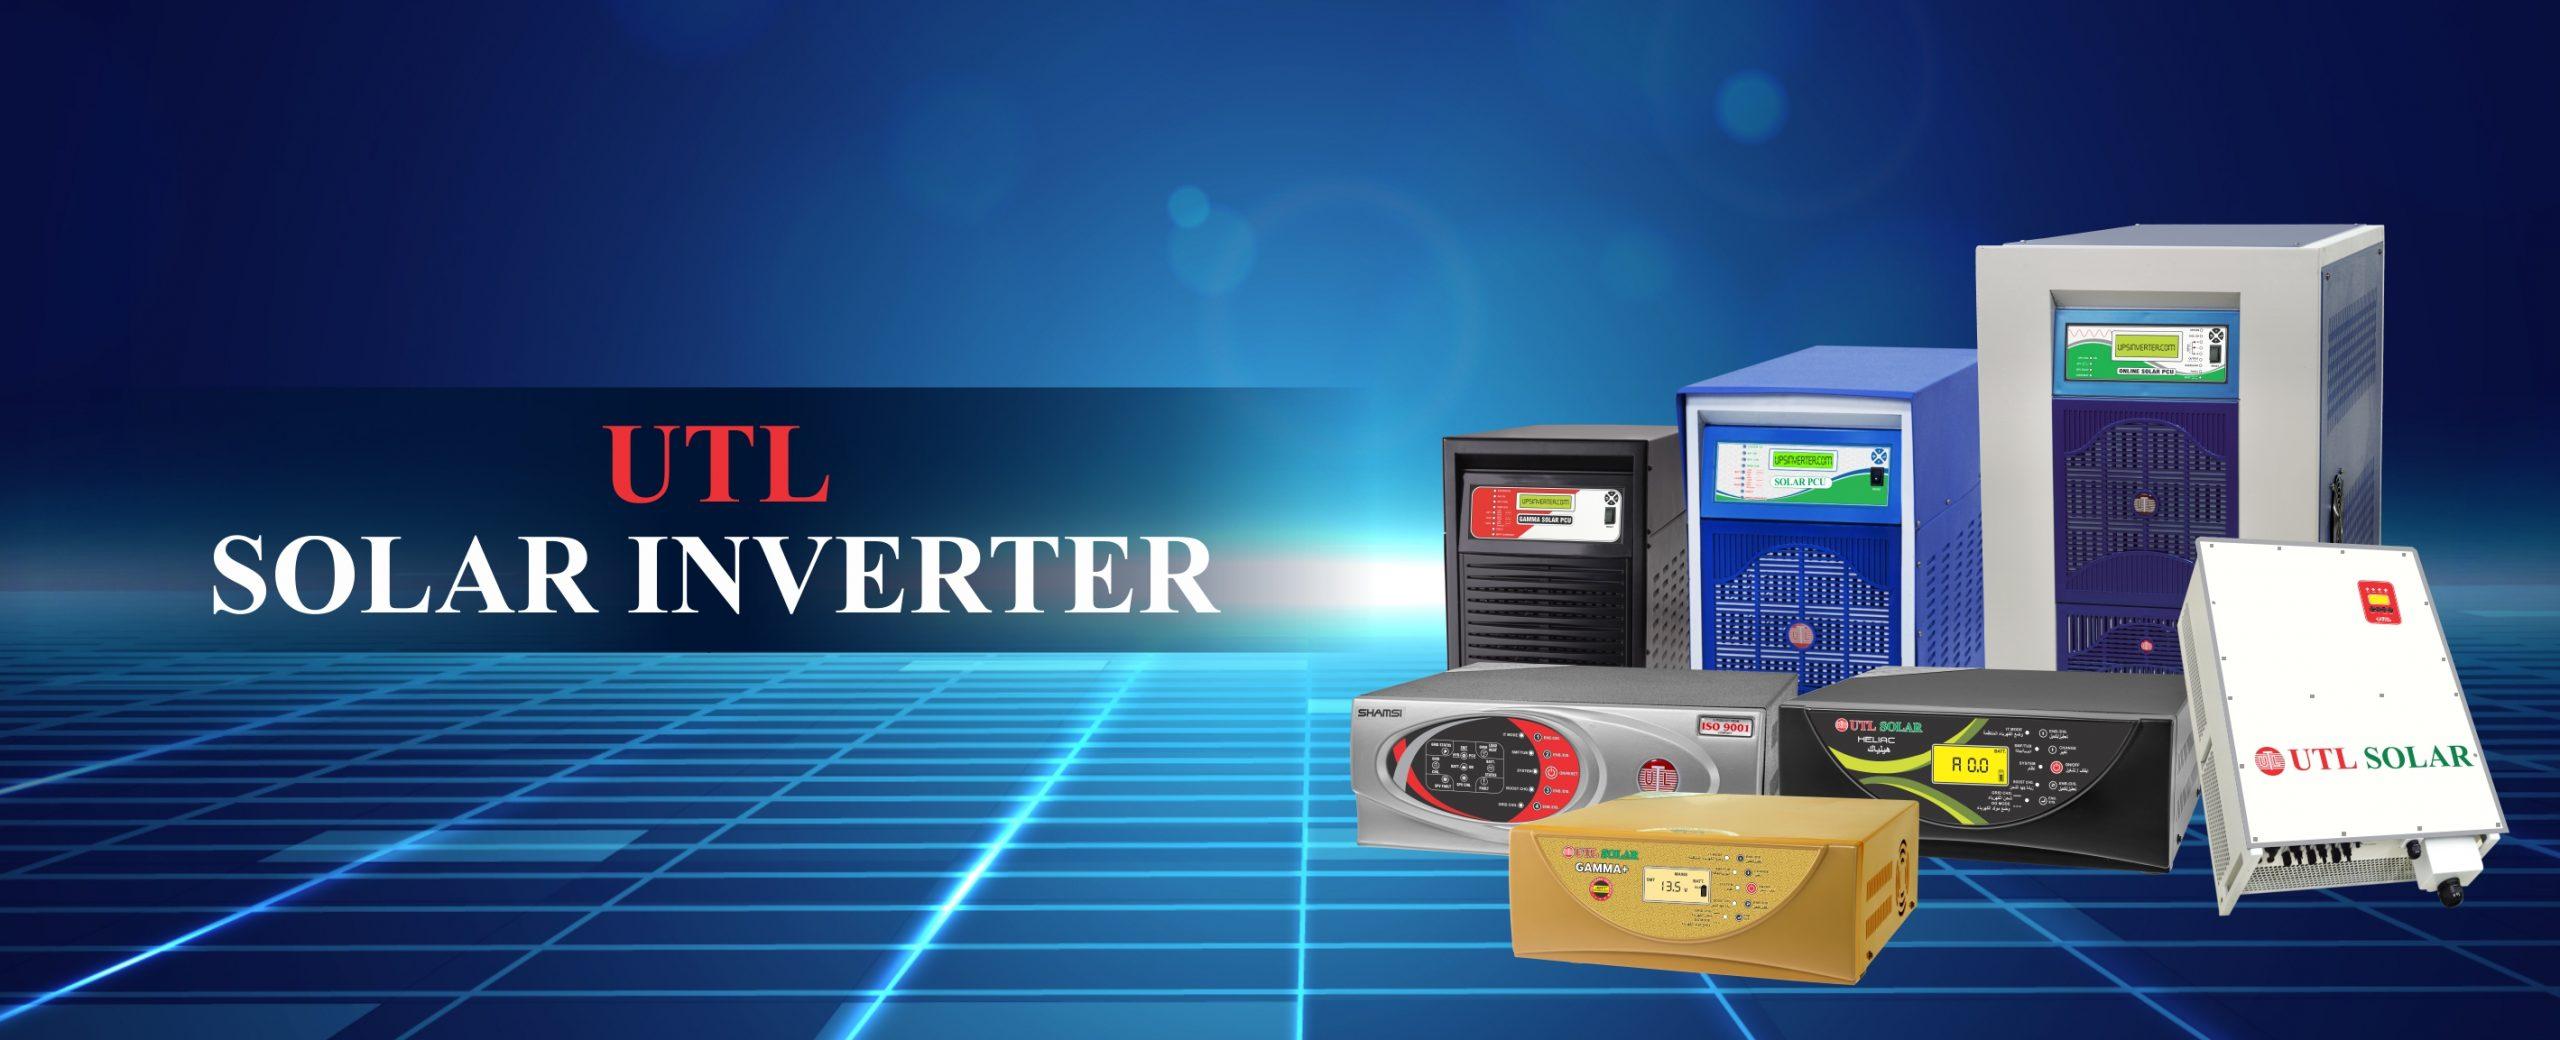 UTL Solar Inverter Range from 1kW to 120kVA